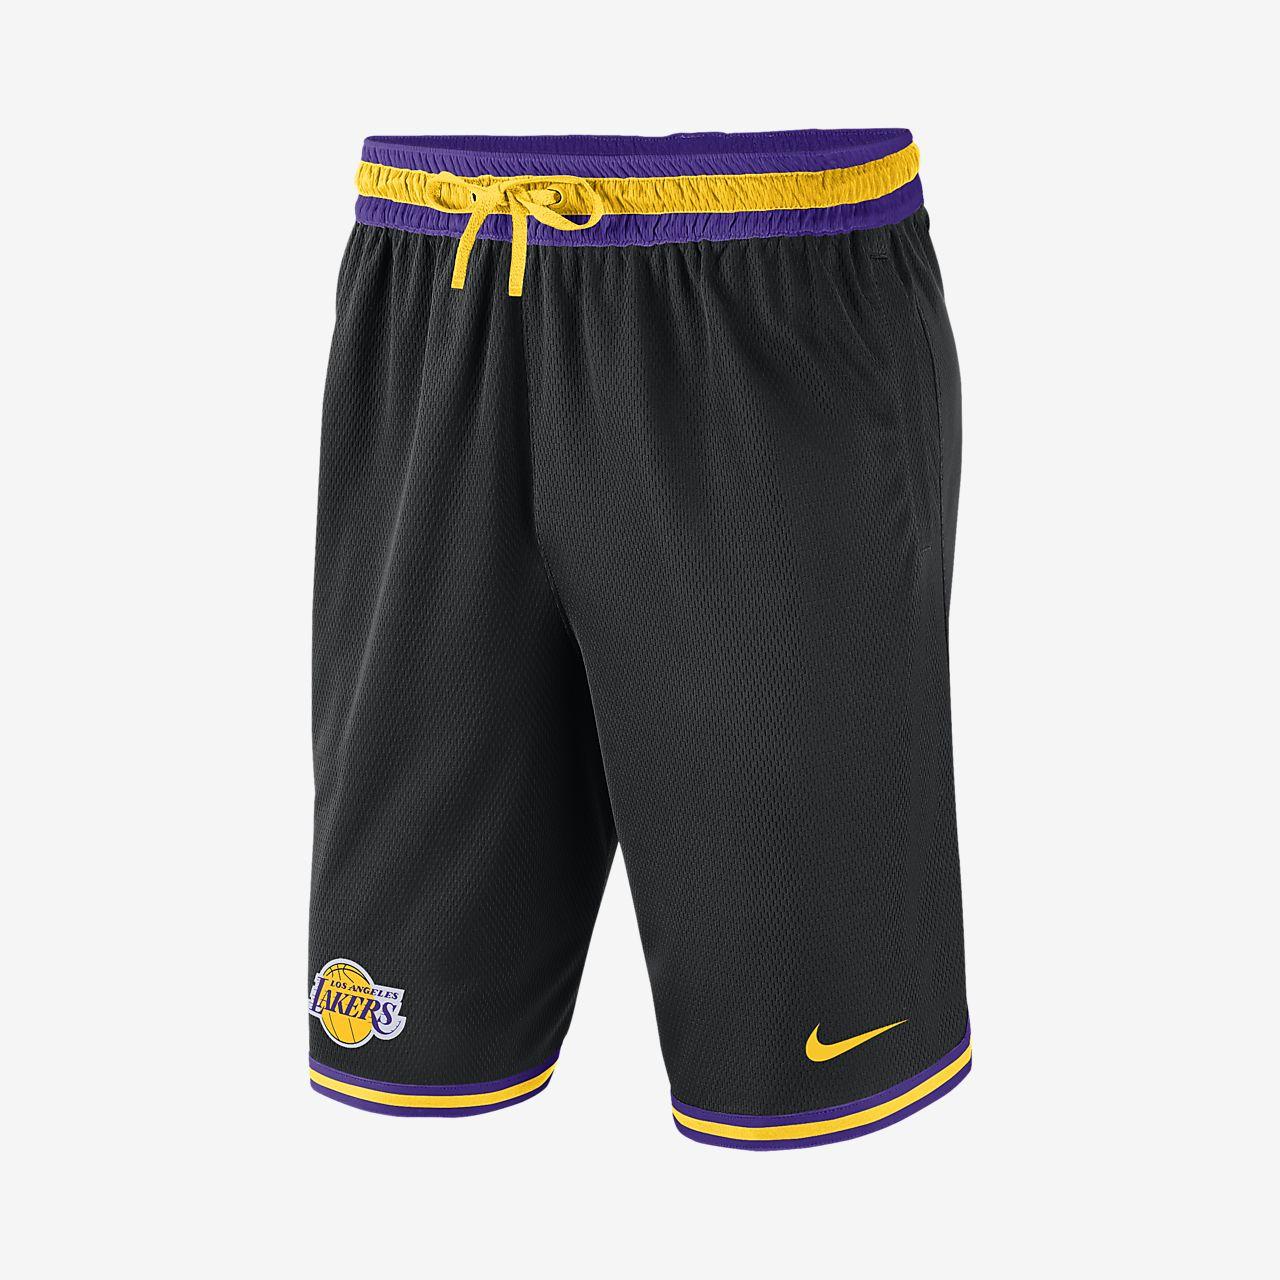 Los Angeles Lakers Nike Men's NBA Shorts